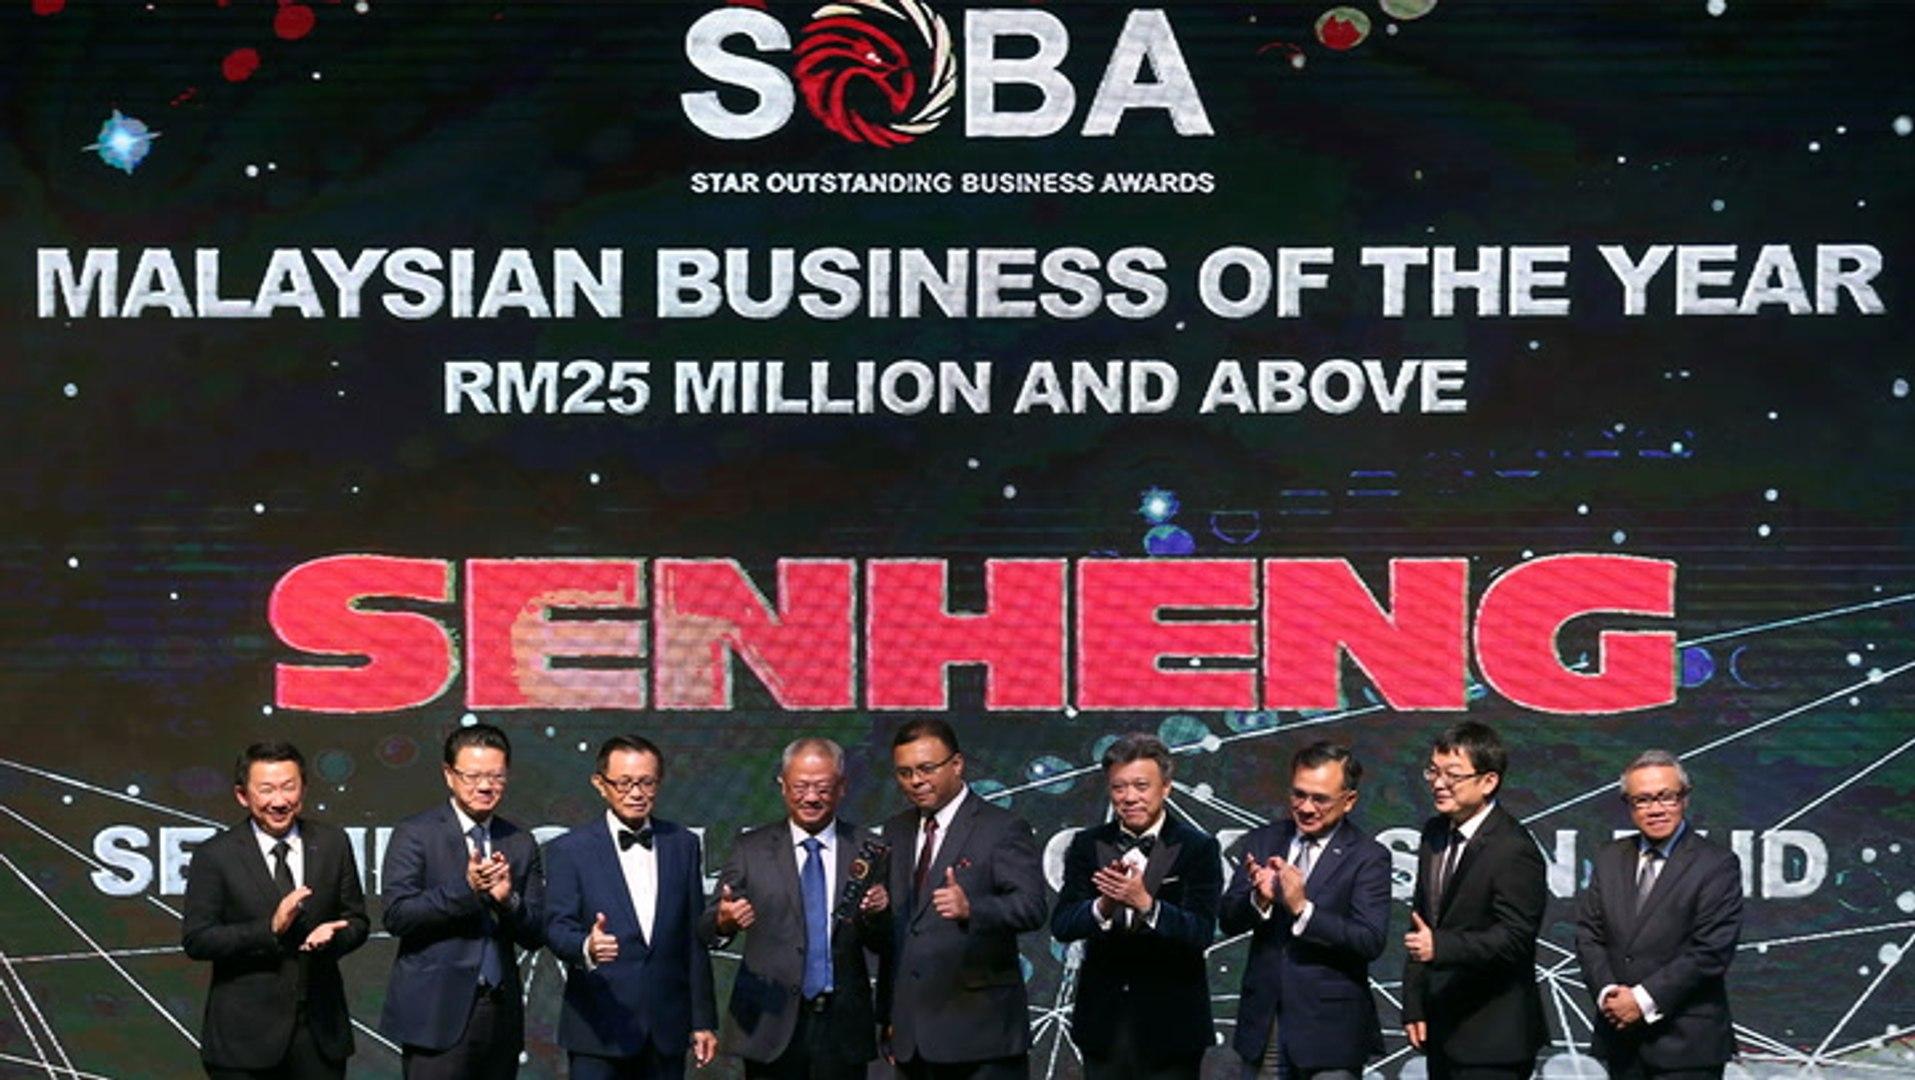 Senheng wins big at SOBA 2018